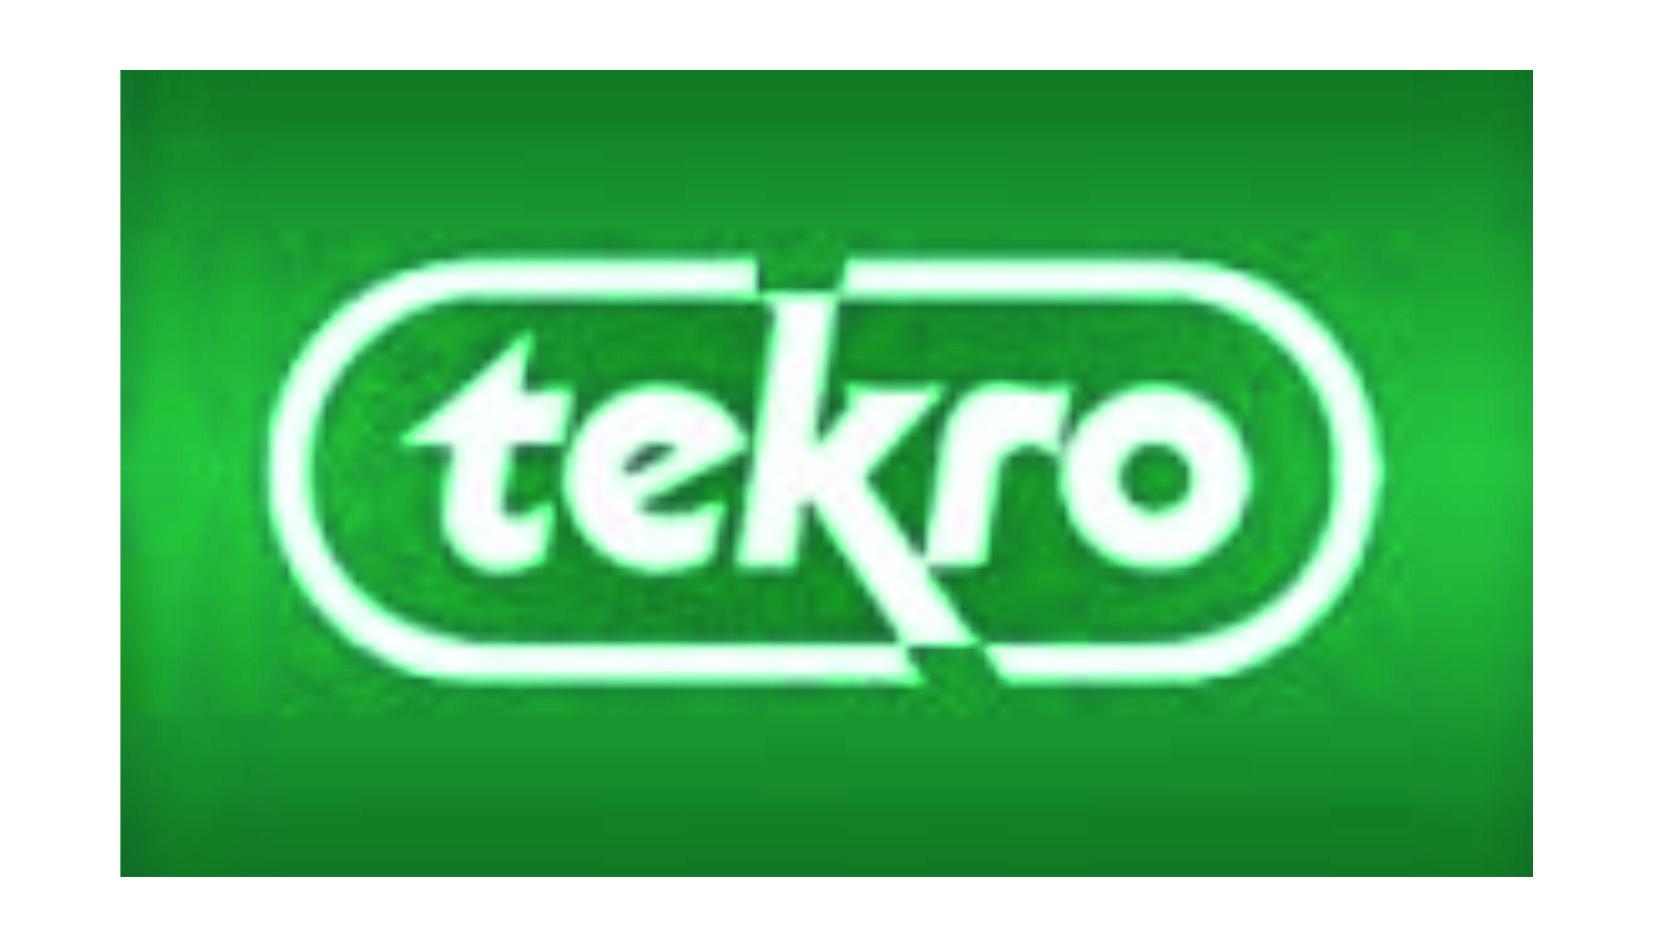 процедура due diligence объекта покупки для «Текро»